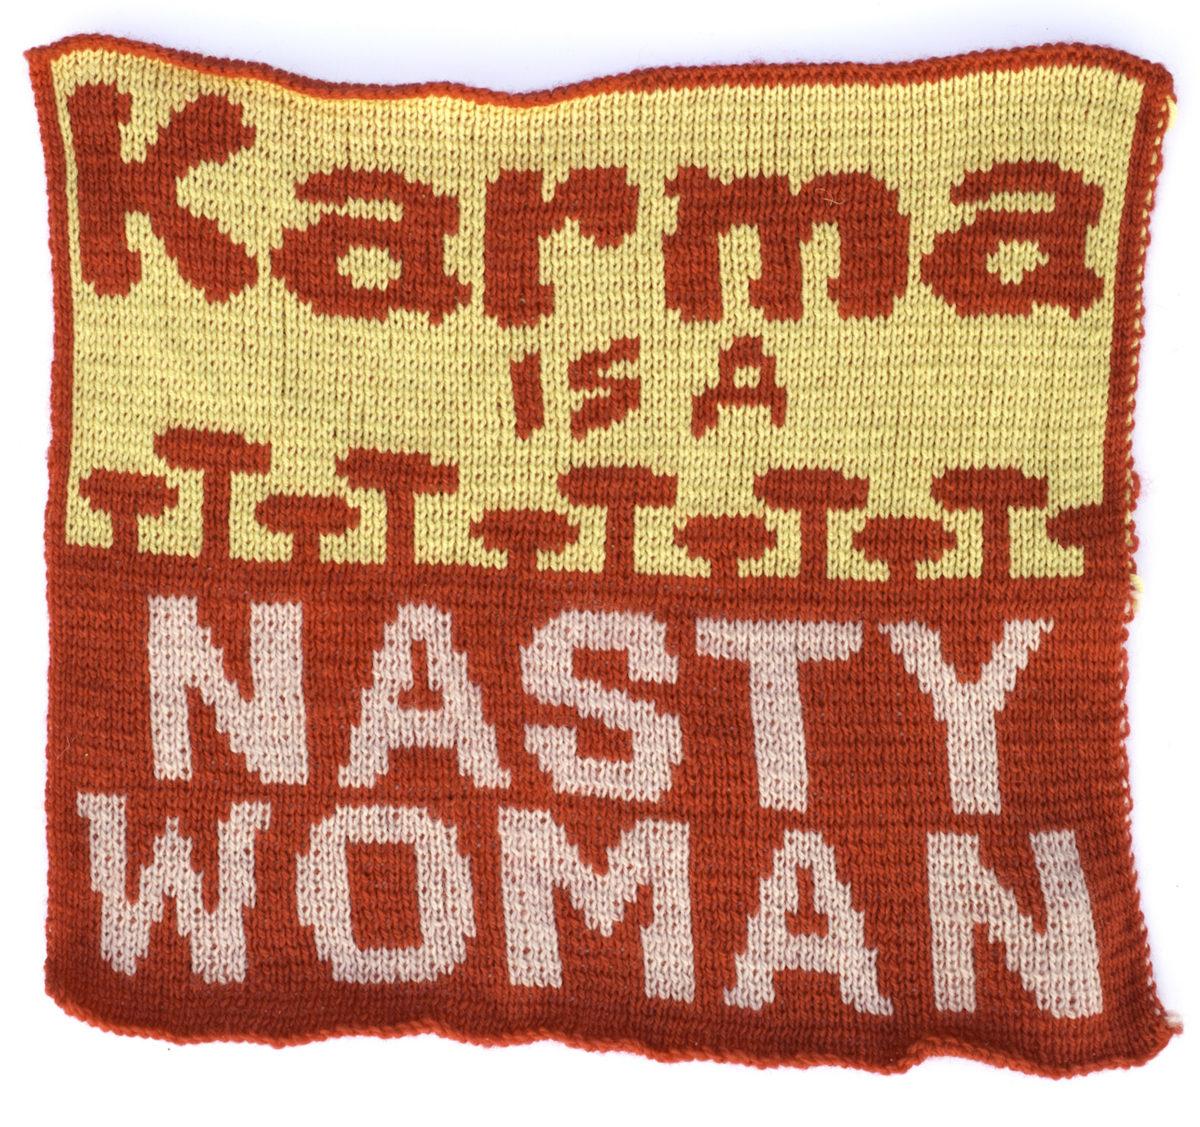 Lisa Anne Auerbach, Karma is a Nasty Woman, 2020. Courtesy of the artist and GAVLAK Los Angeles / Palm Beach.